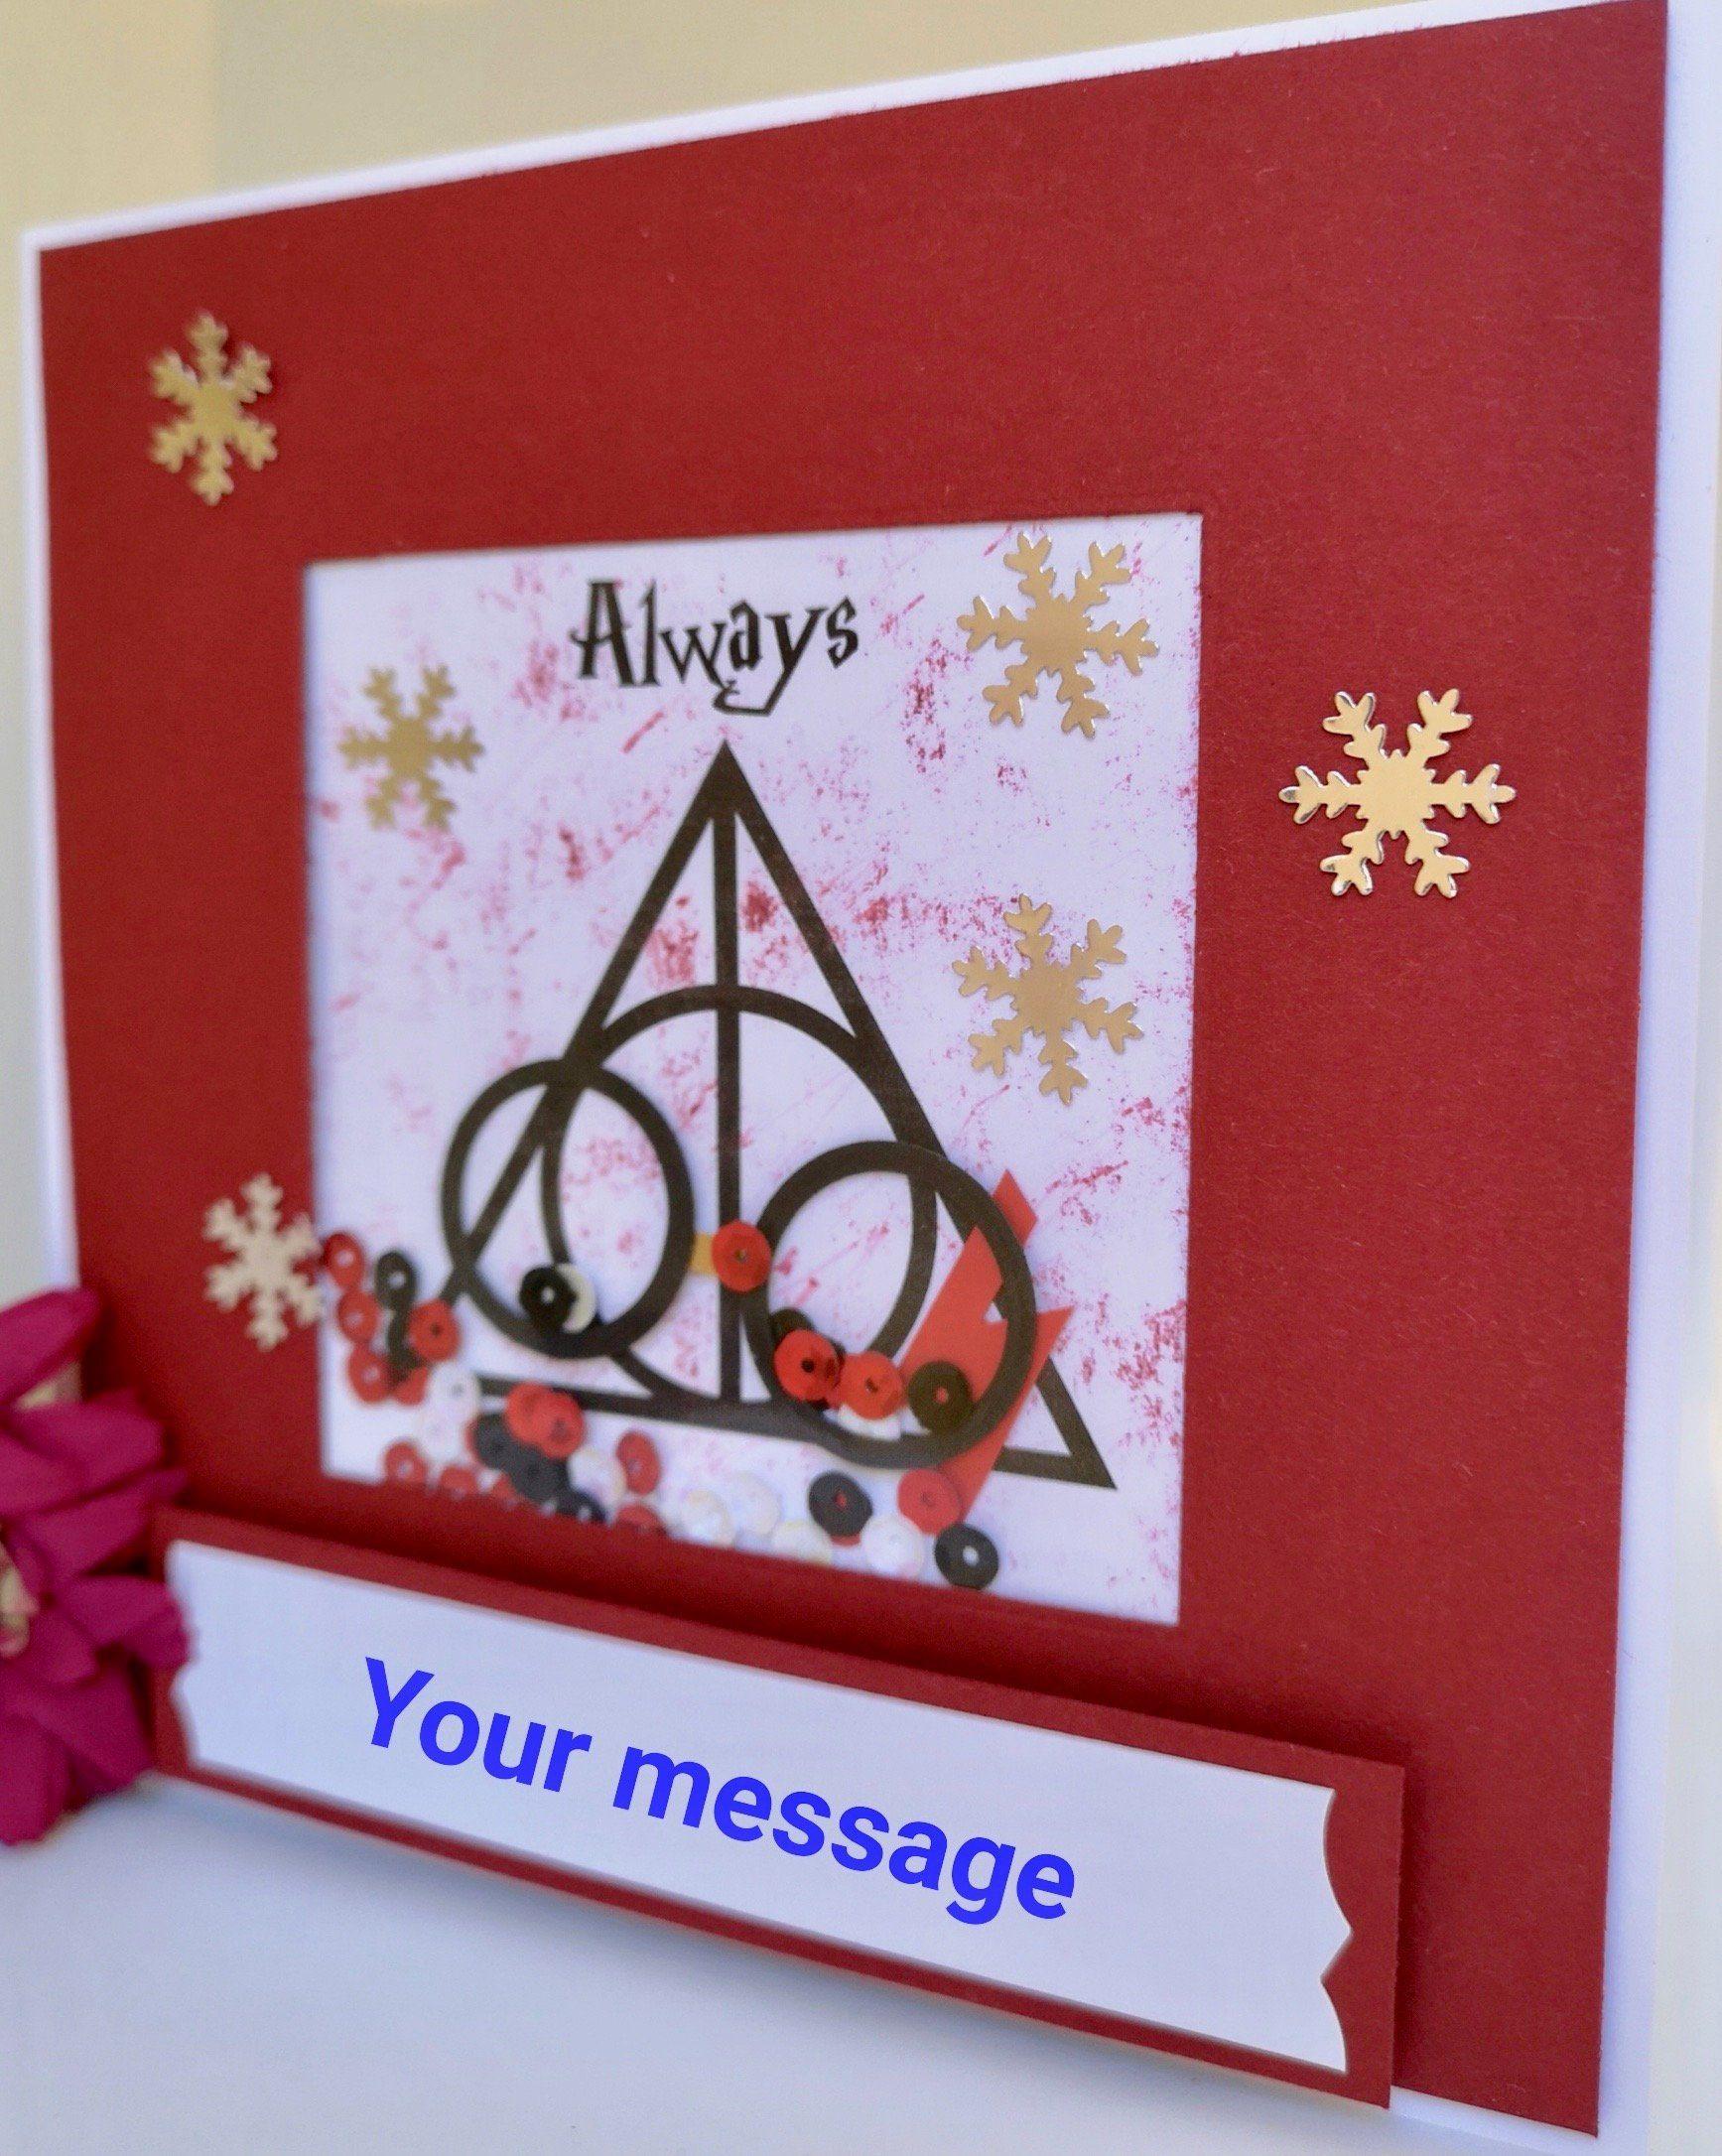 Personalised Harry Potter Shaker Christmas Card Always Hogwarts Glasses Scar Sequins Snowflakes Handmade Kids Adults By Brig Handmade Kids Etsy Christmas Cards